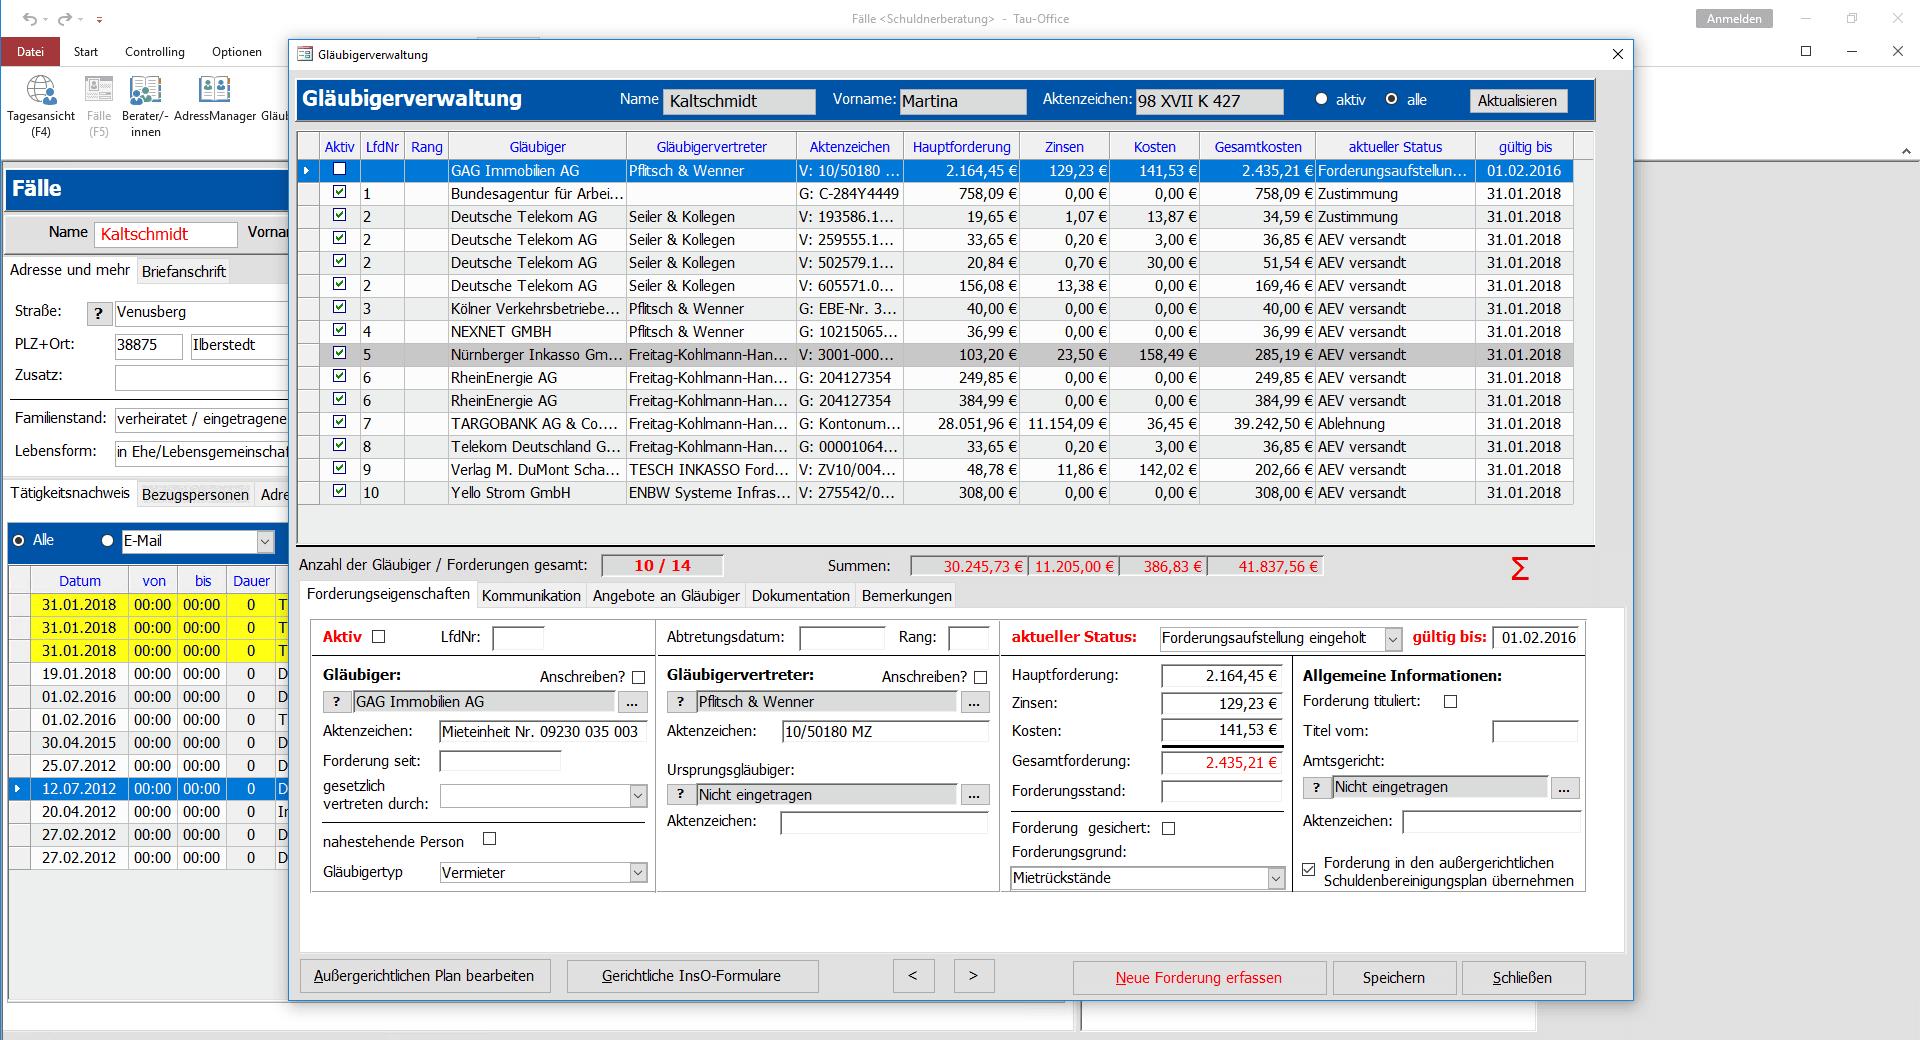 Gläubigerverwaltung-compressor